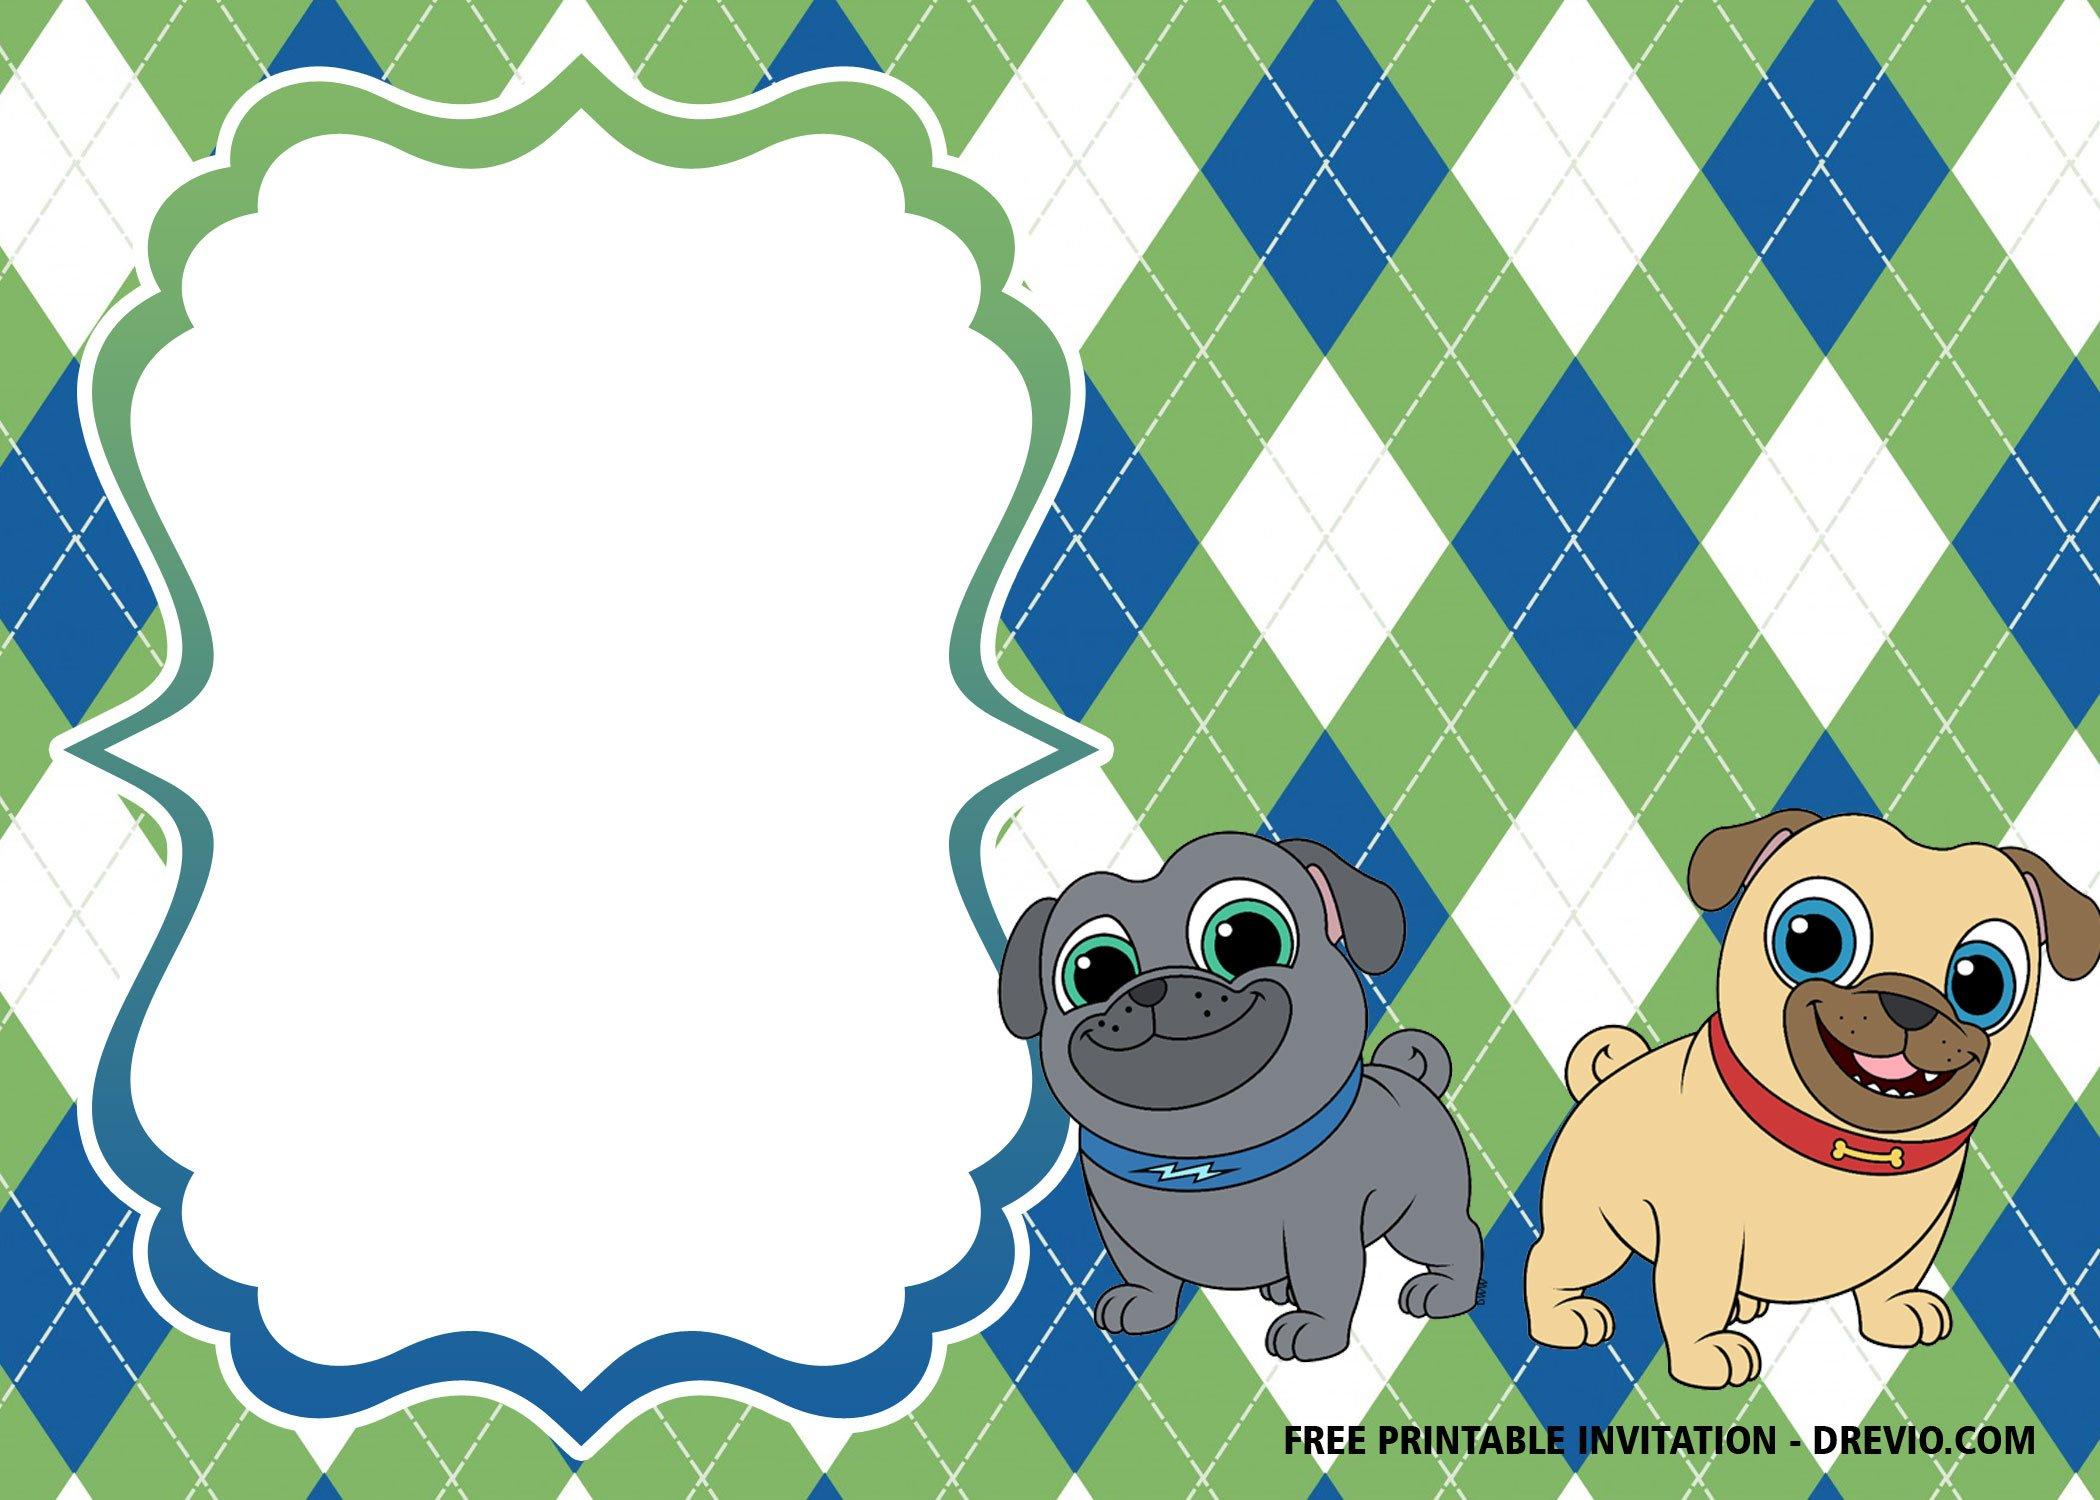 Cute Baby Girl Wallpaper Free Download Free Disney Puppy Dog Pals Invitation Templates Drevio